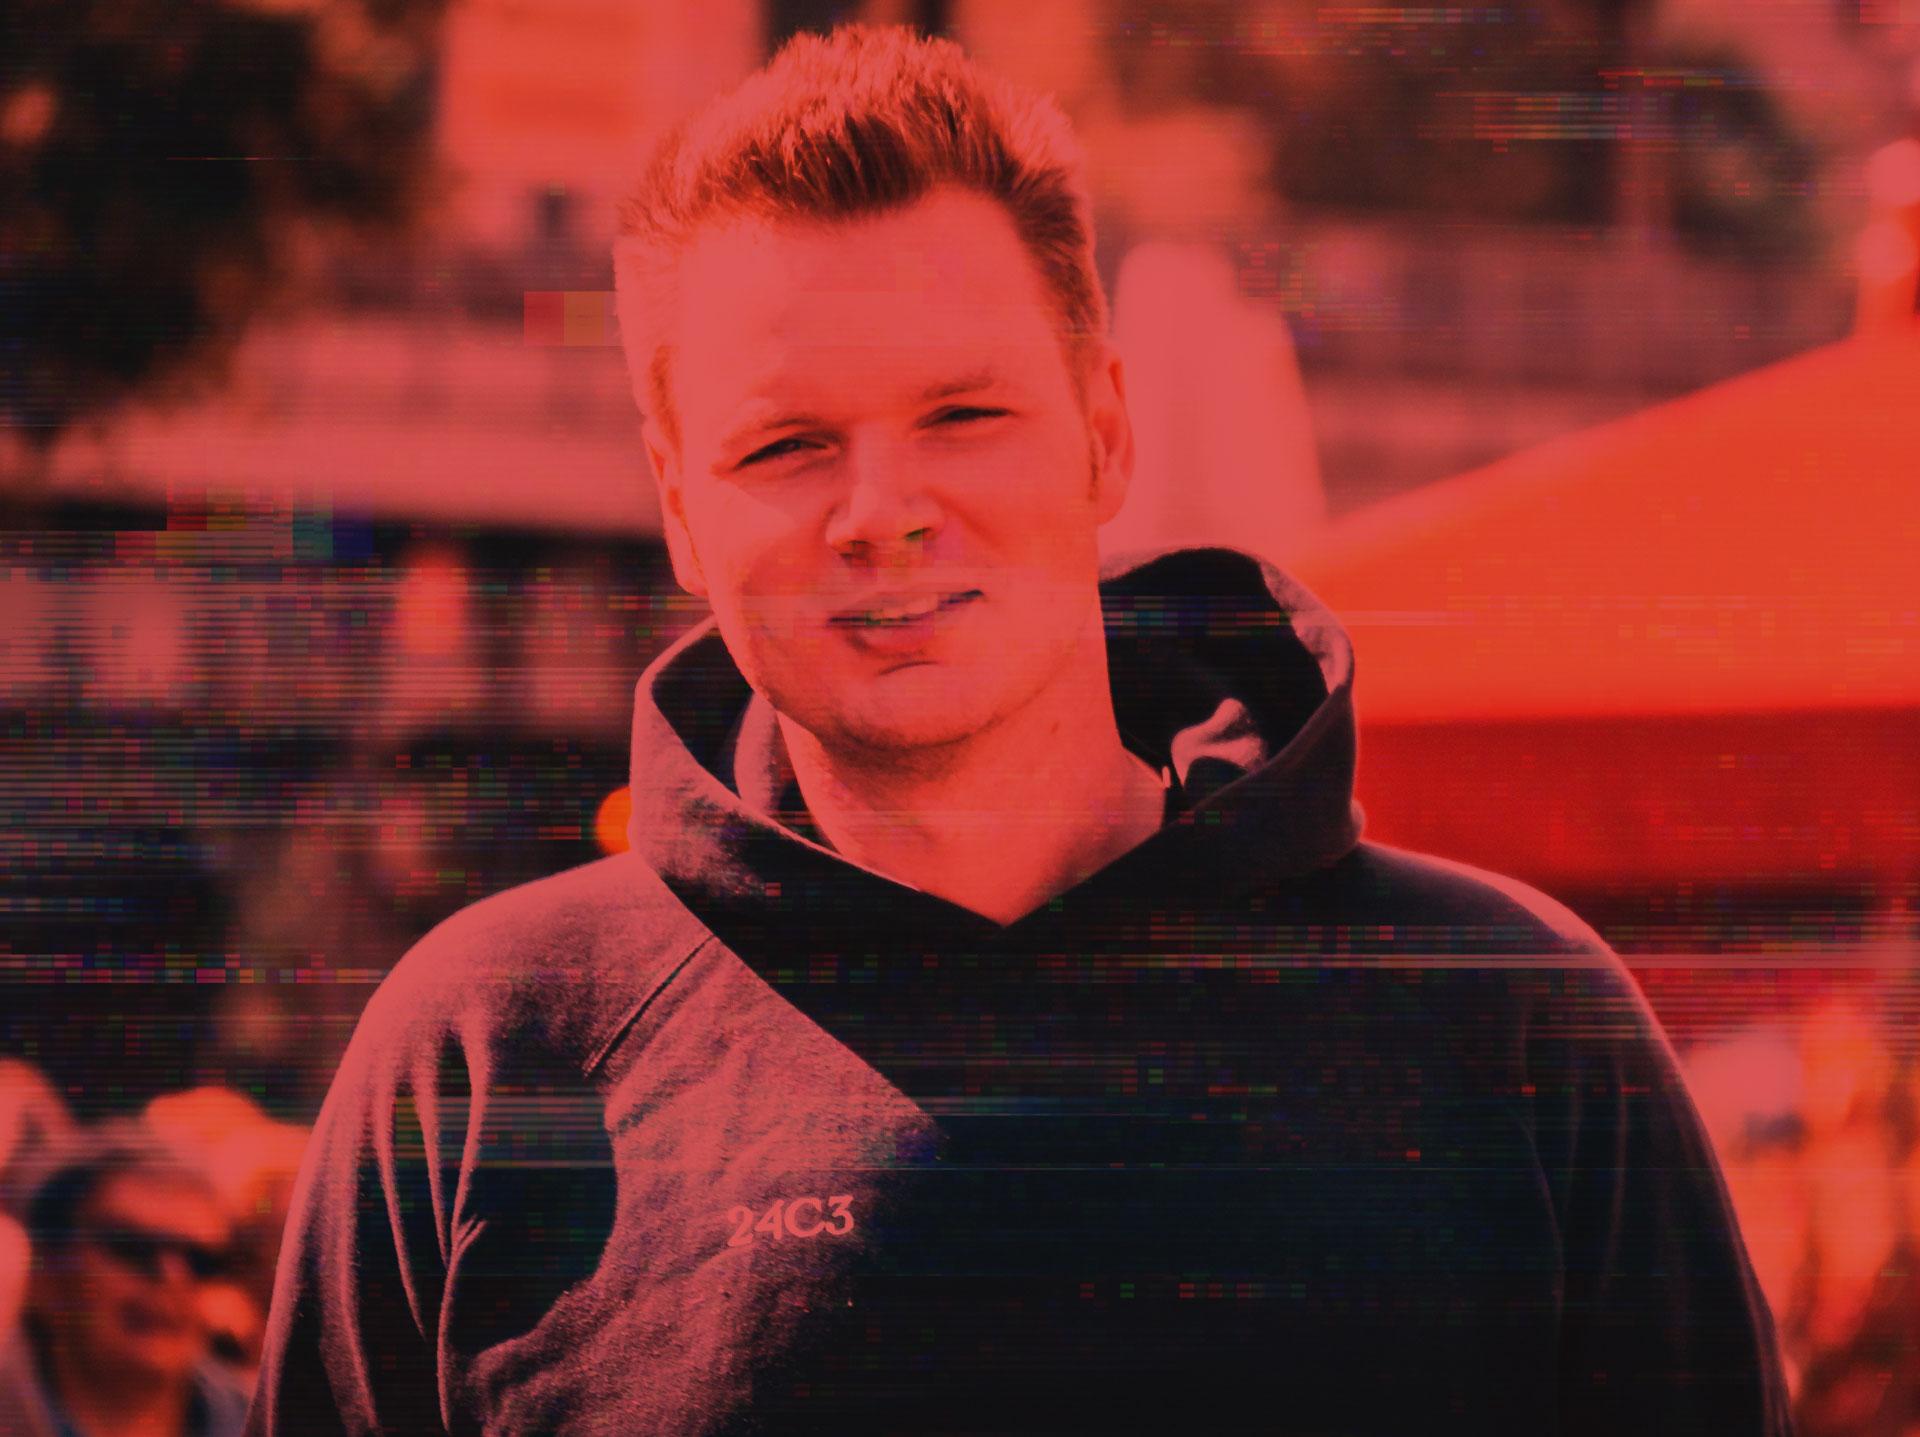 Tom Van de Wiele Q&A: Reflections of a red teamer